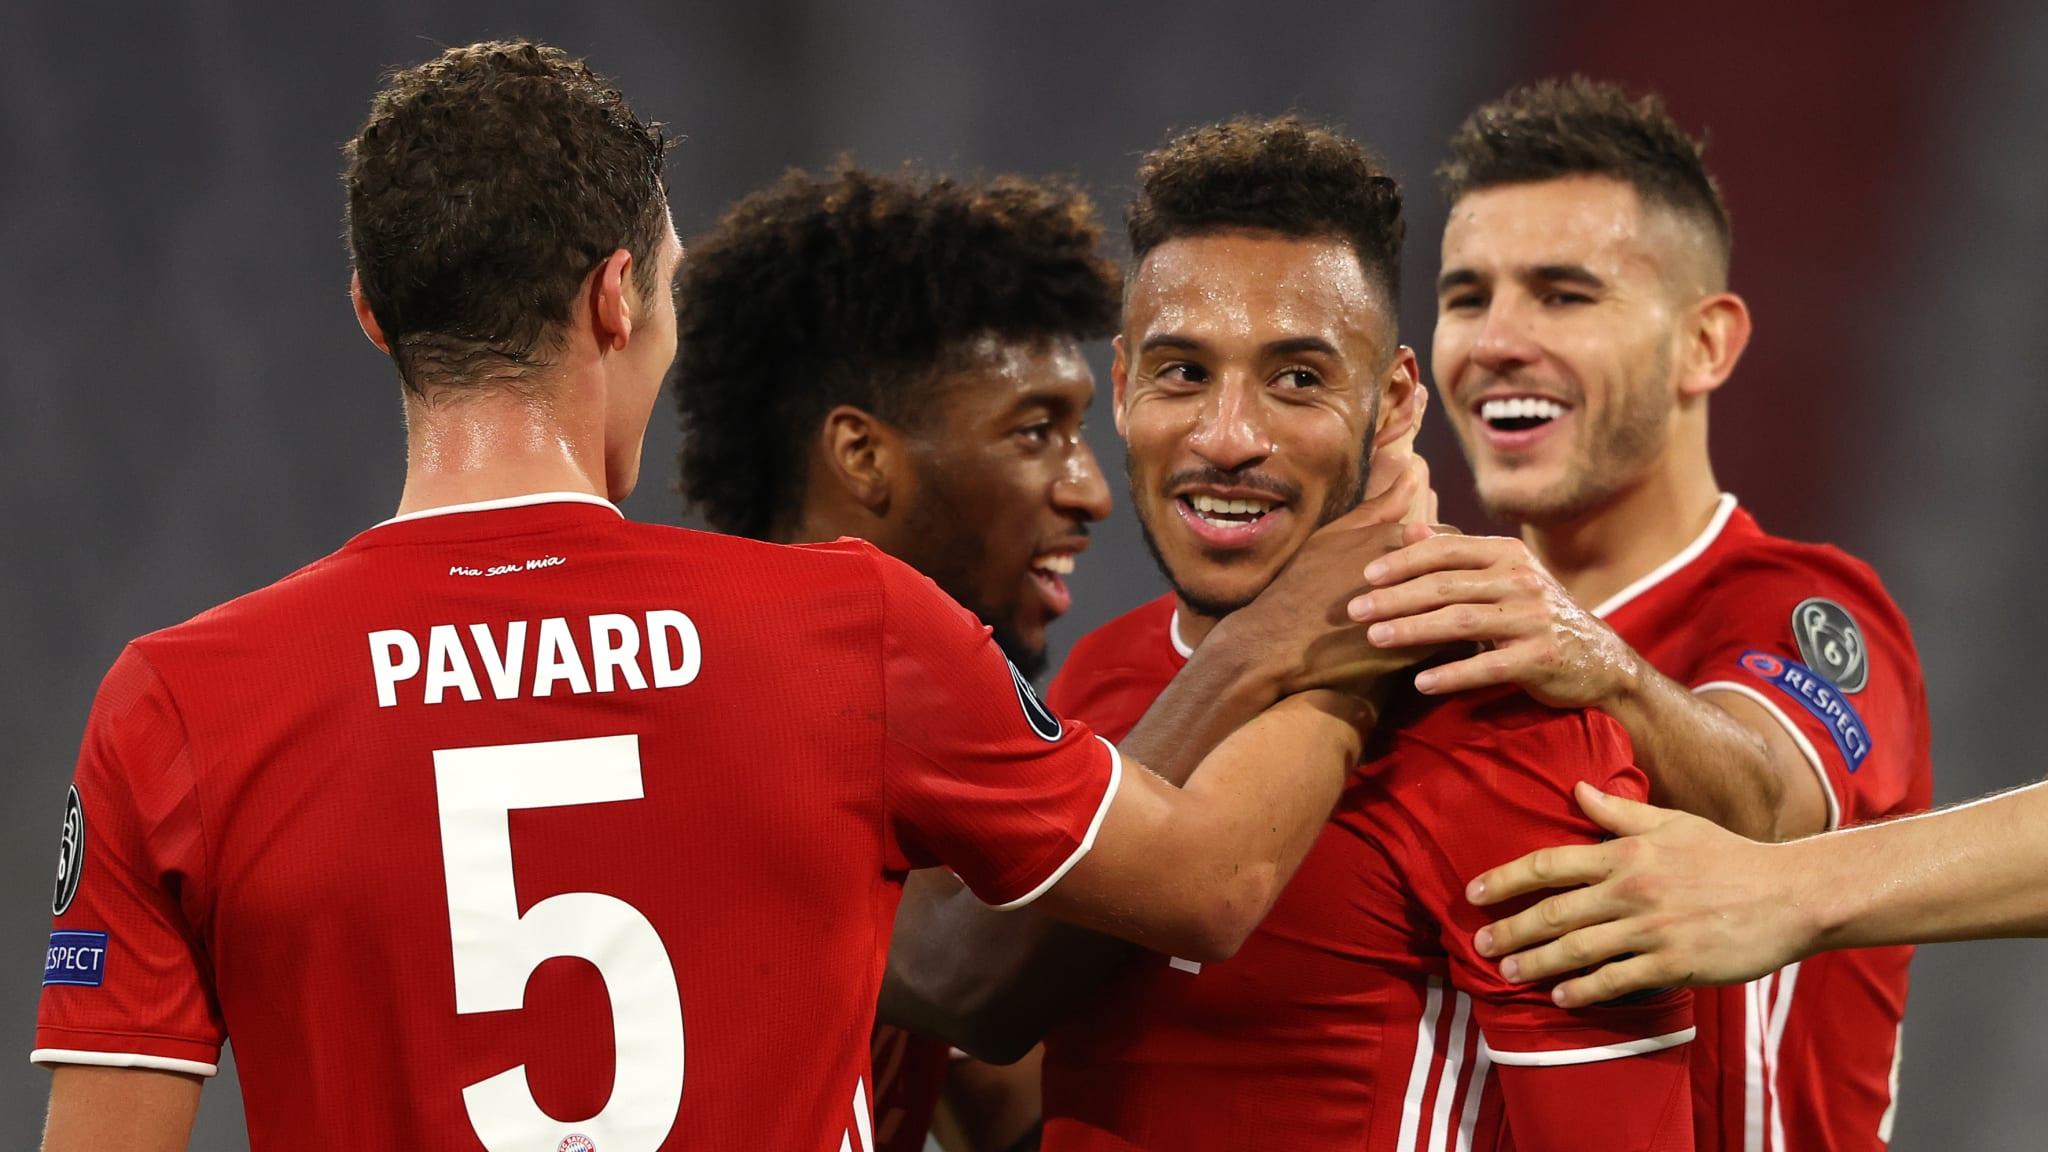 Corentin Tolisso of Bayern Munich celebrates with teammates